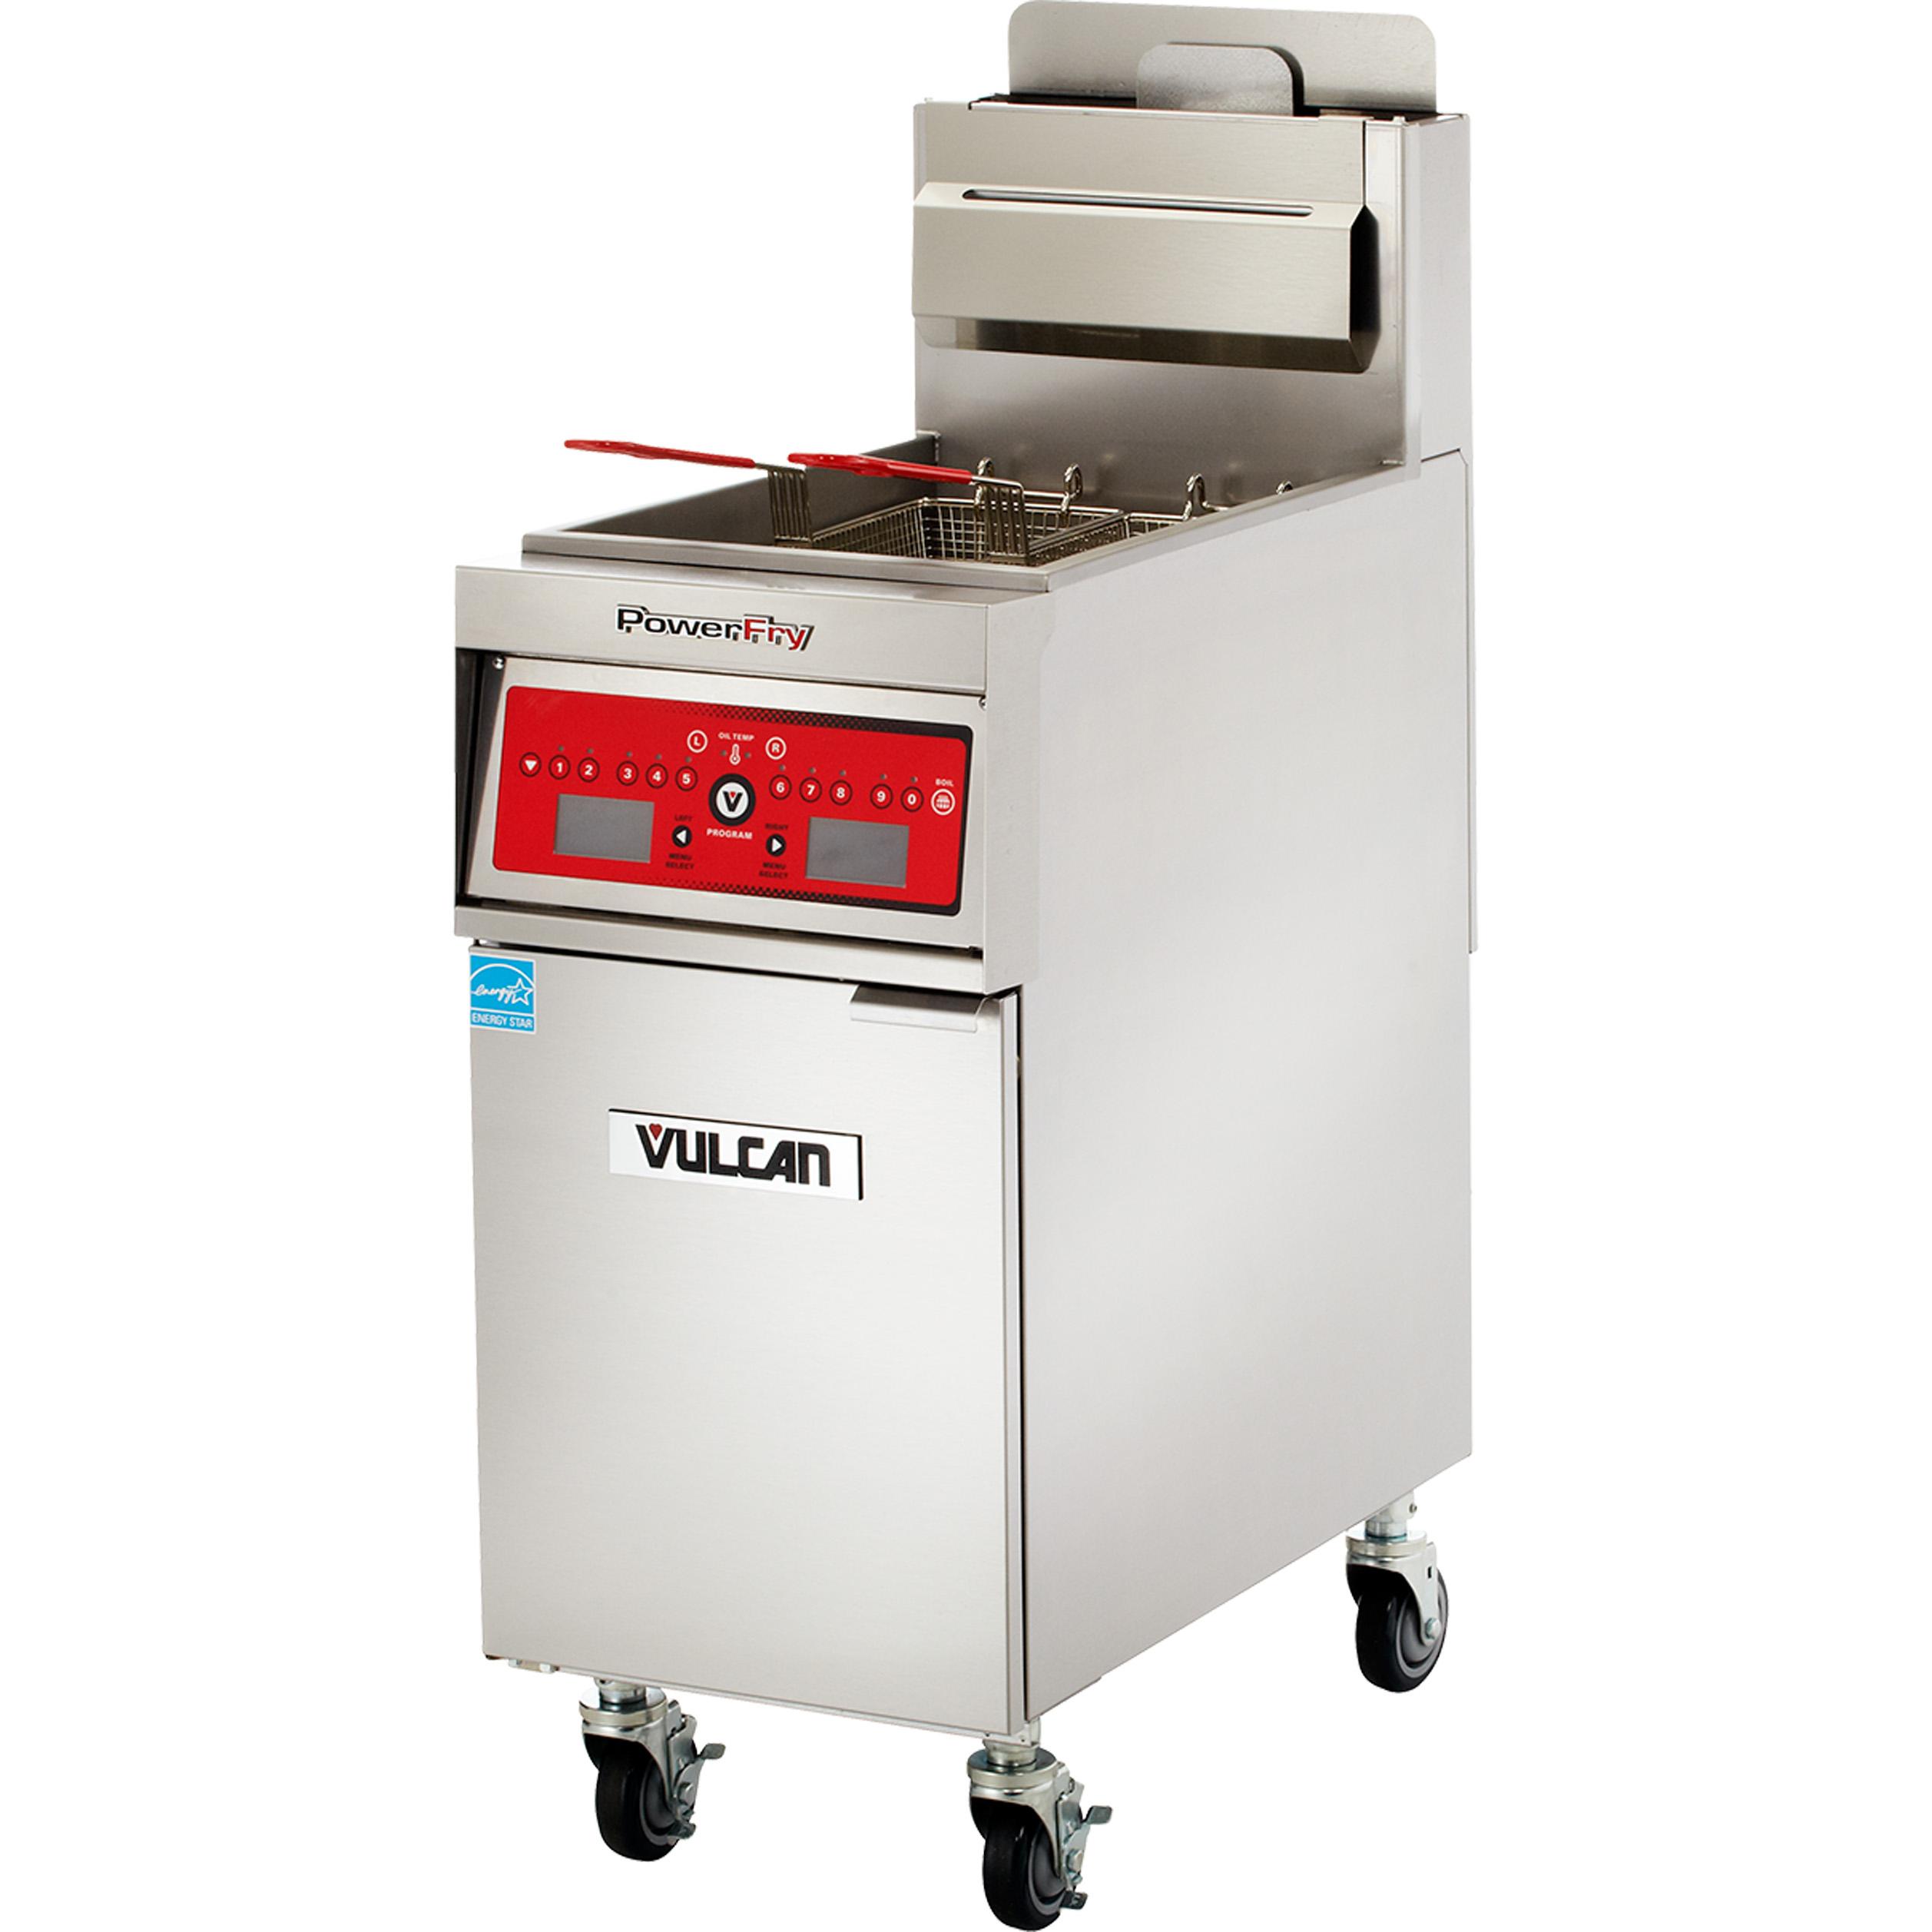 Vulcan 1VK45DF fryer, gas, floor model, full pot